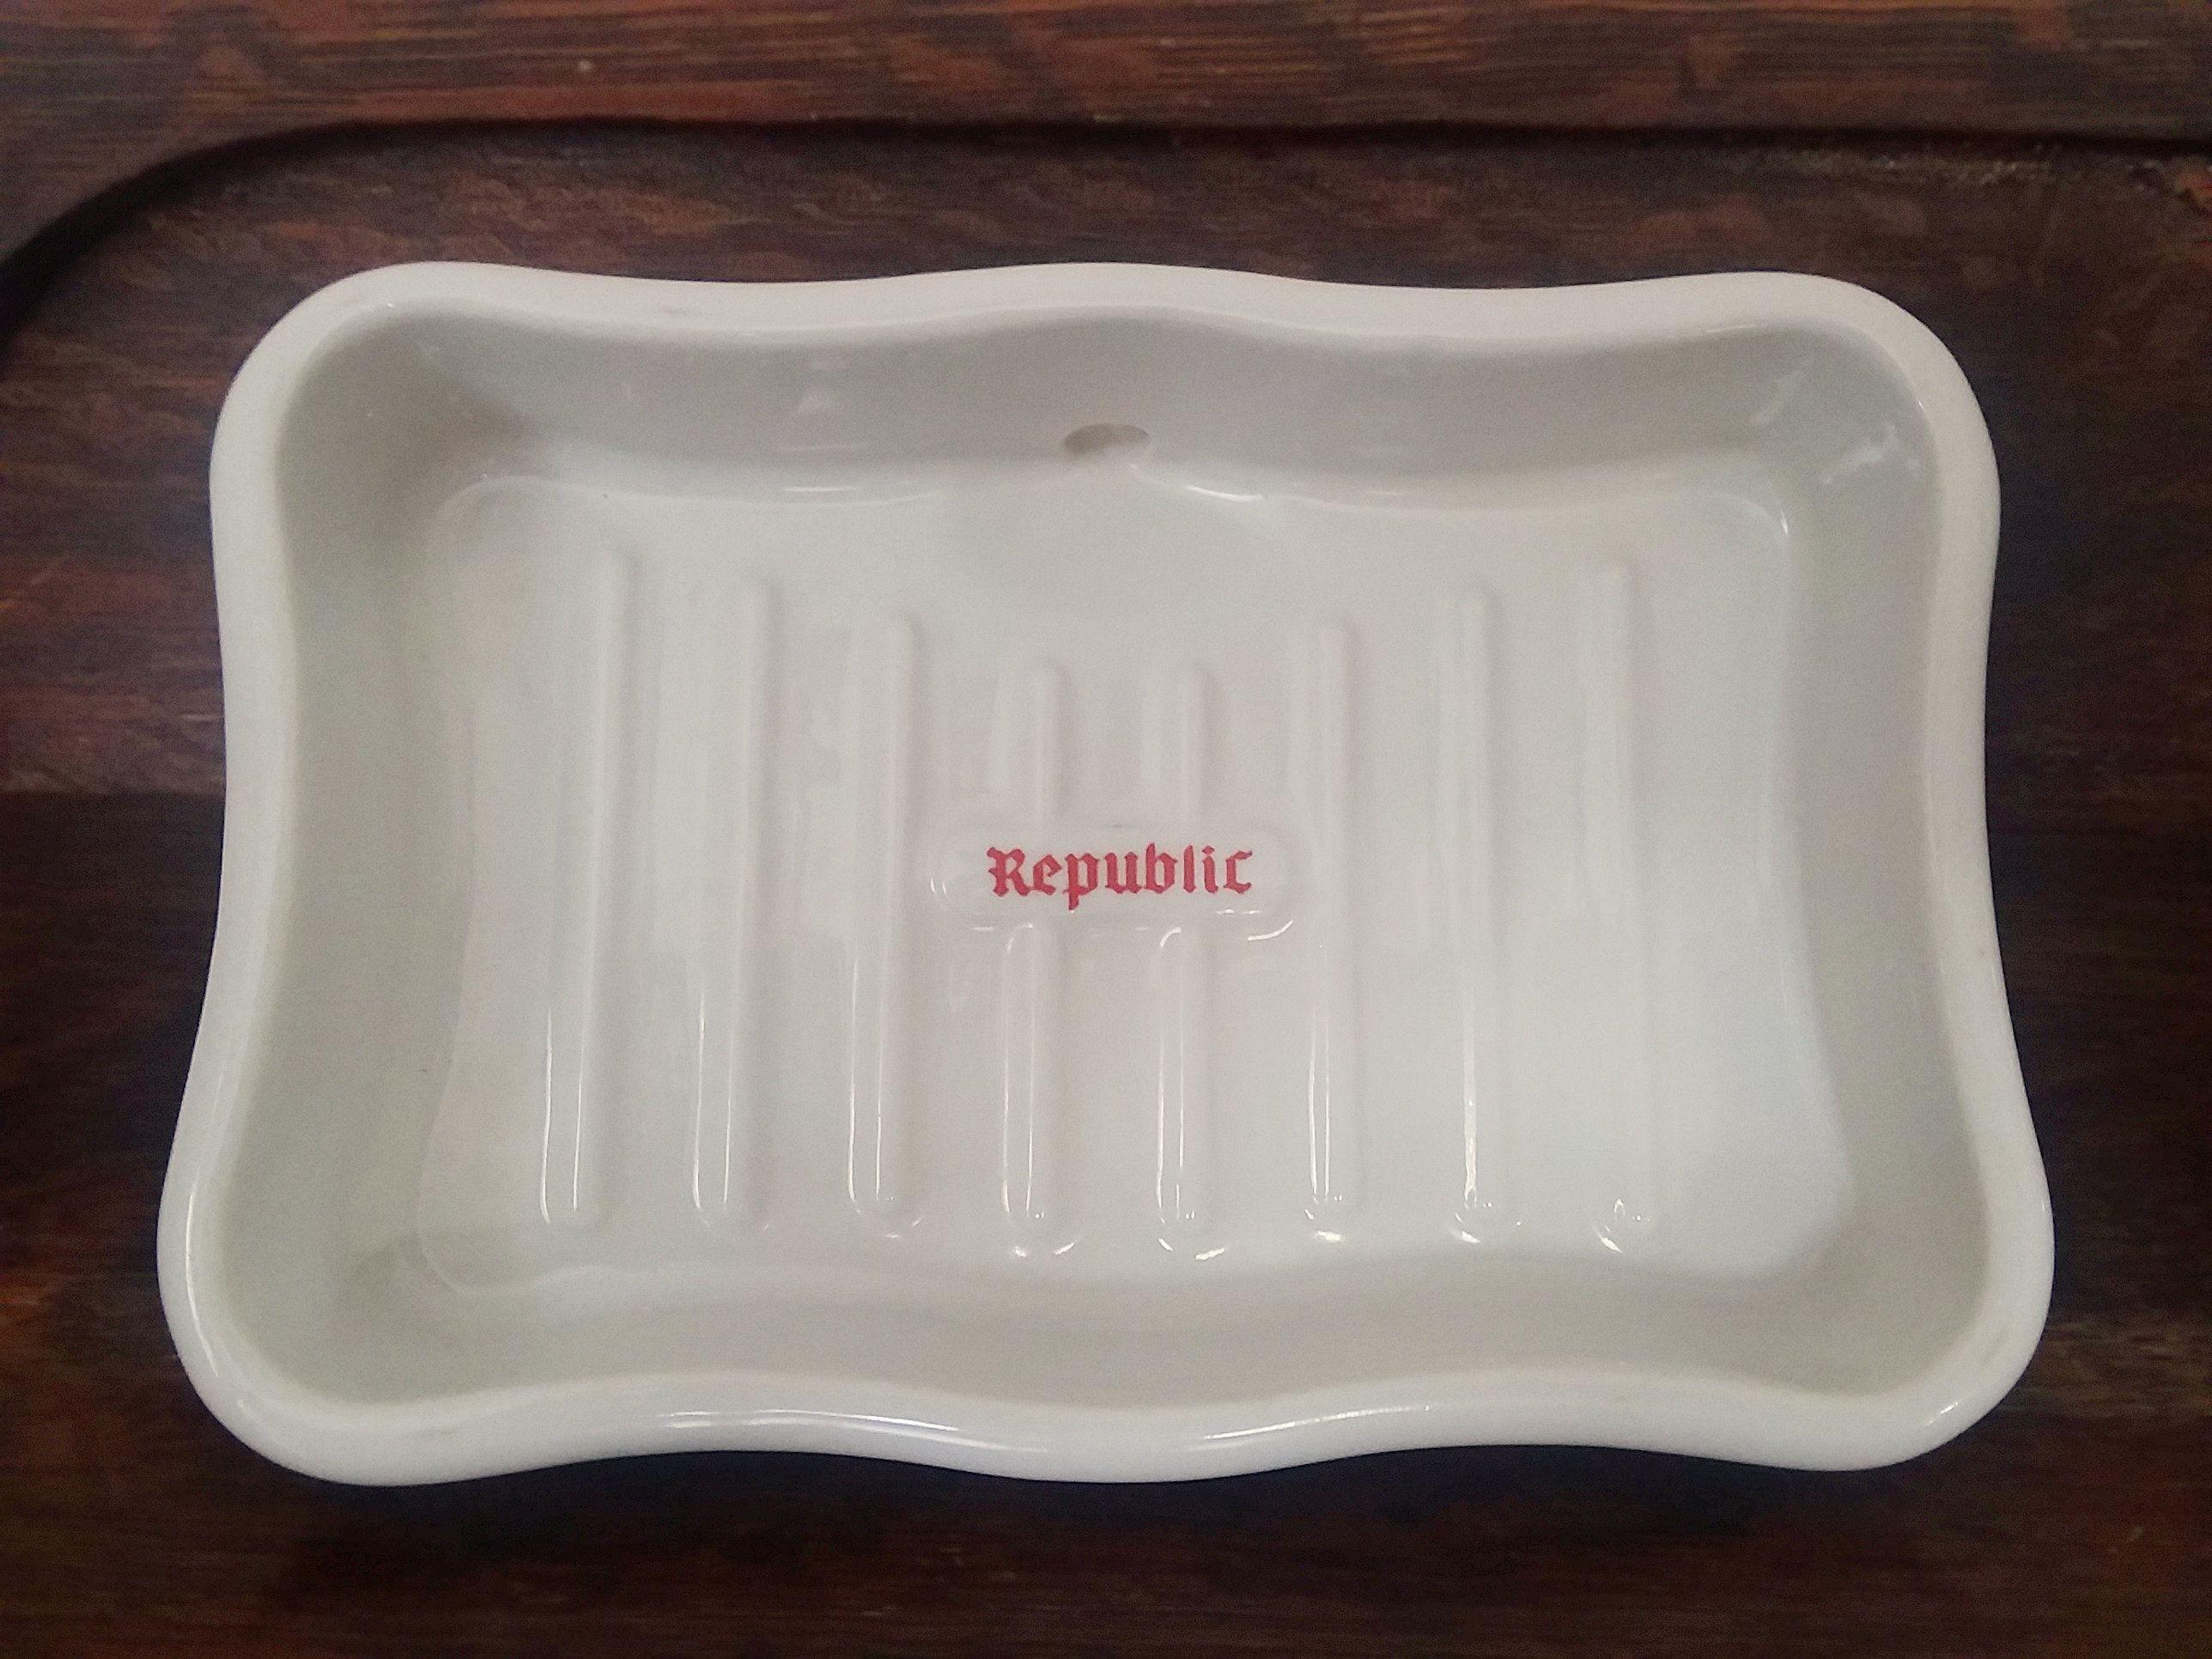 Vintage Republic Porcelain Sink Mount Soap Dish By Springhousecottage On Etsy Porcelain Sink Dish Soap Ceramic Soap Dish